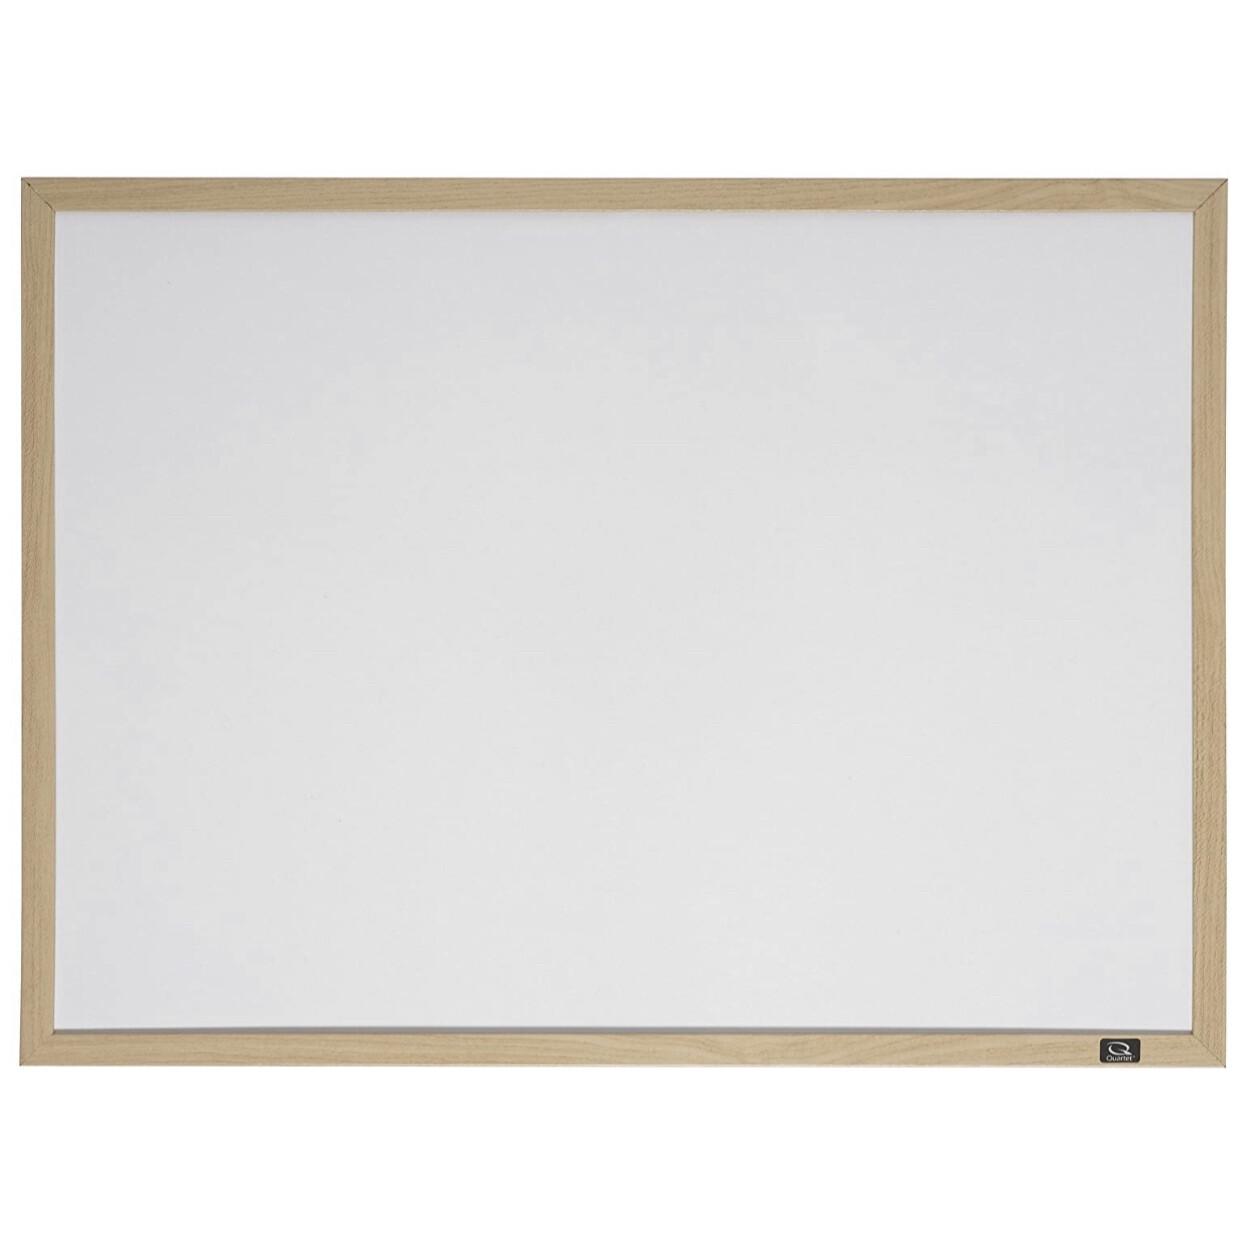 "Whiteboard 23""x 35"", Oak Finish Frame <Pizarra>"